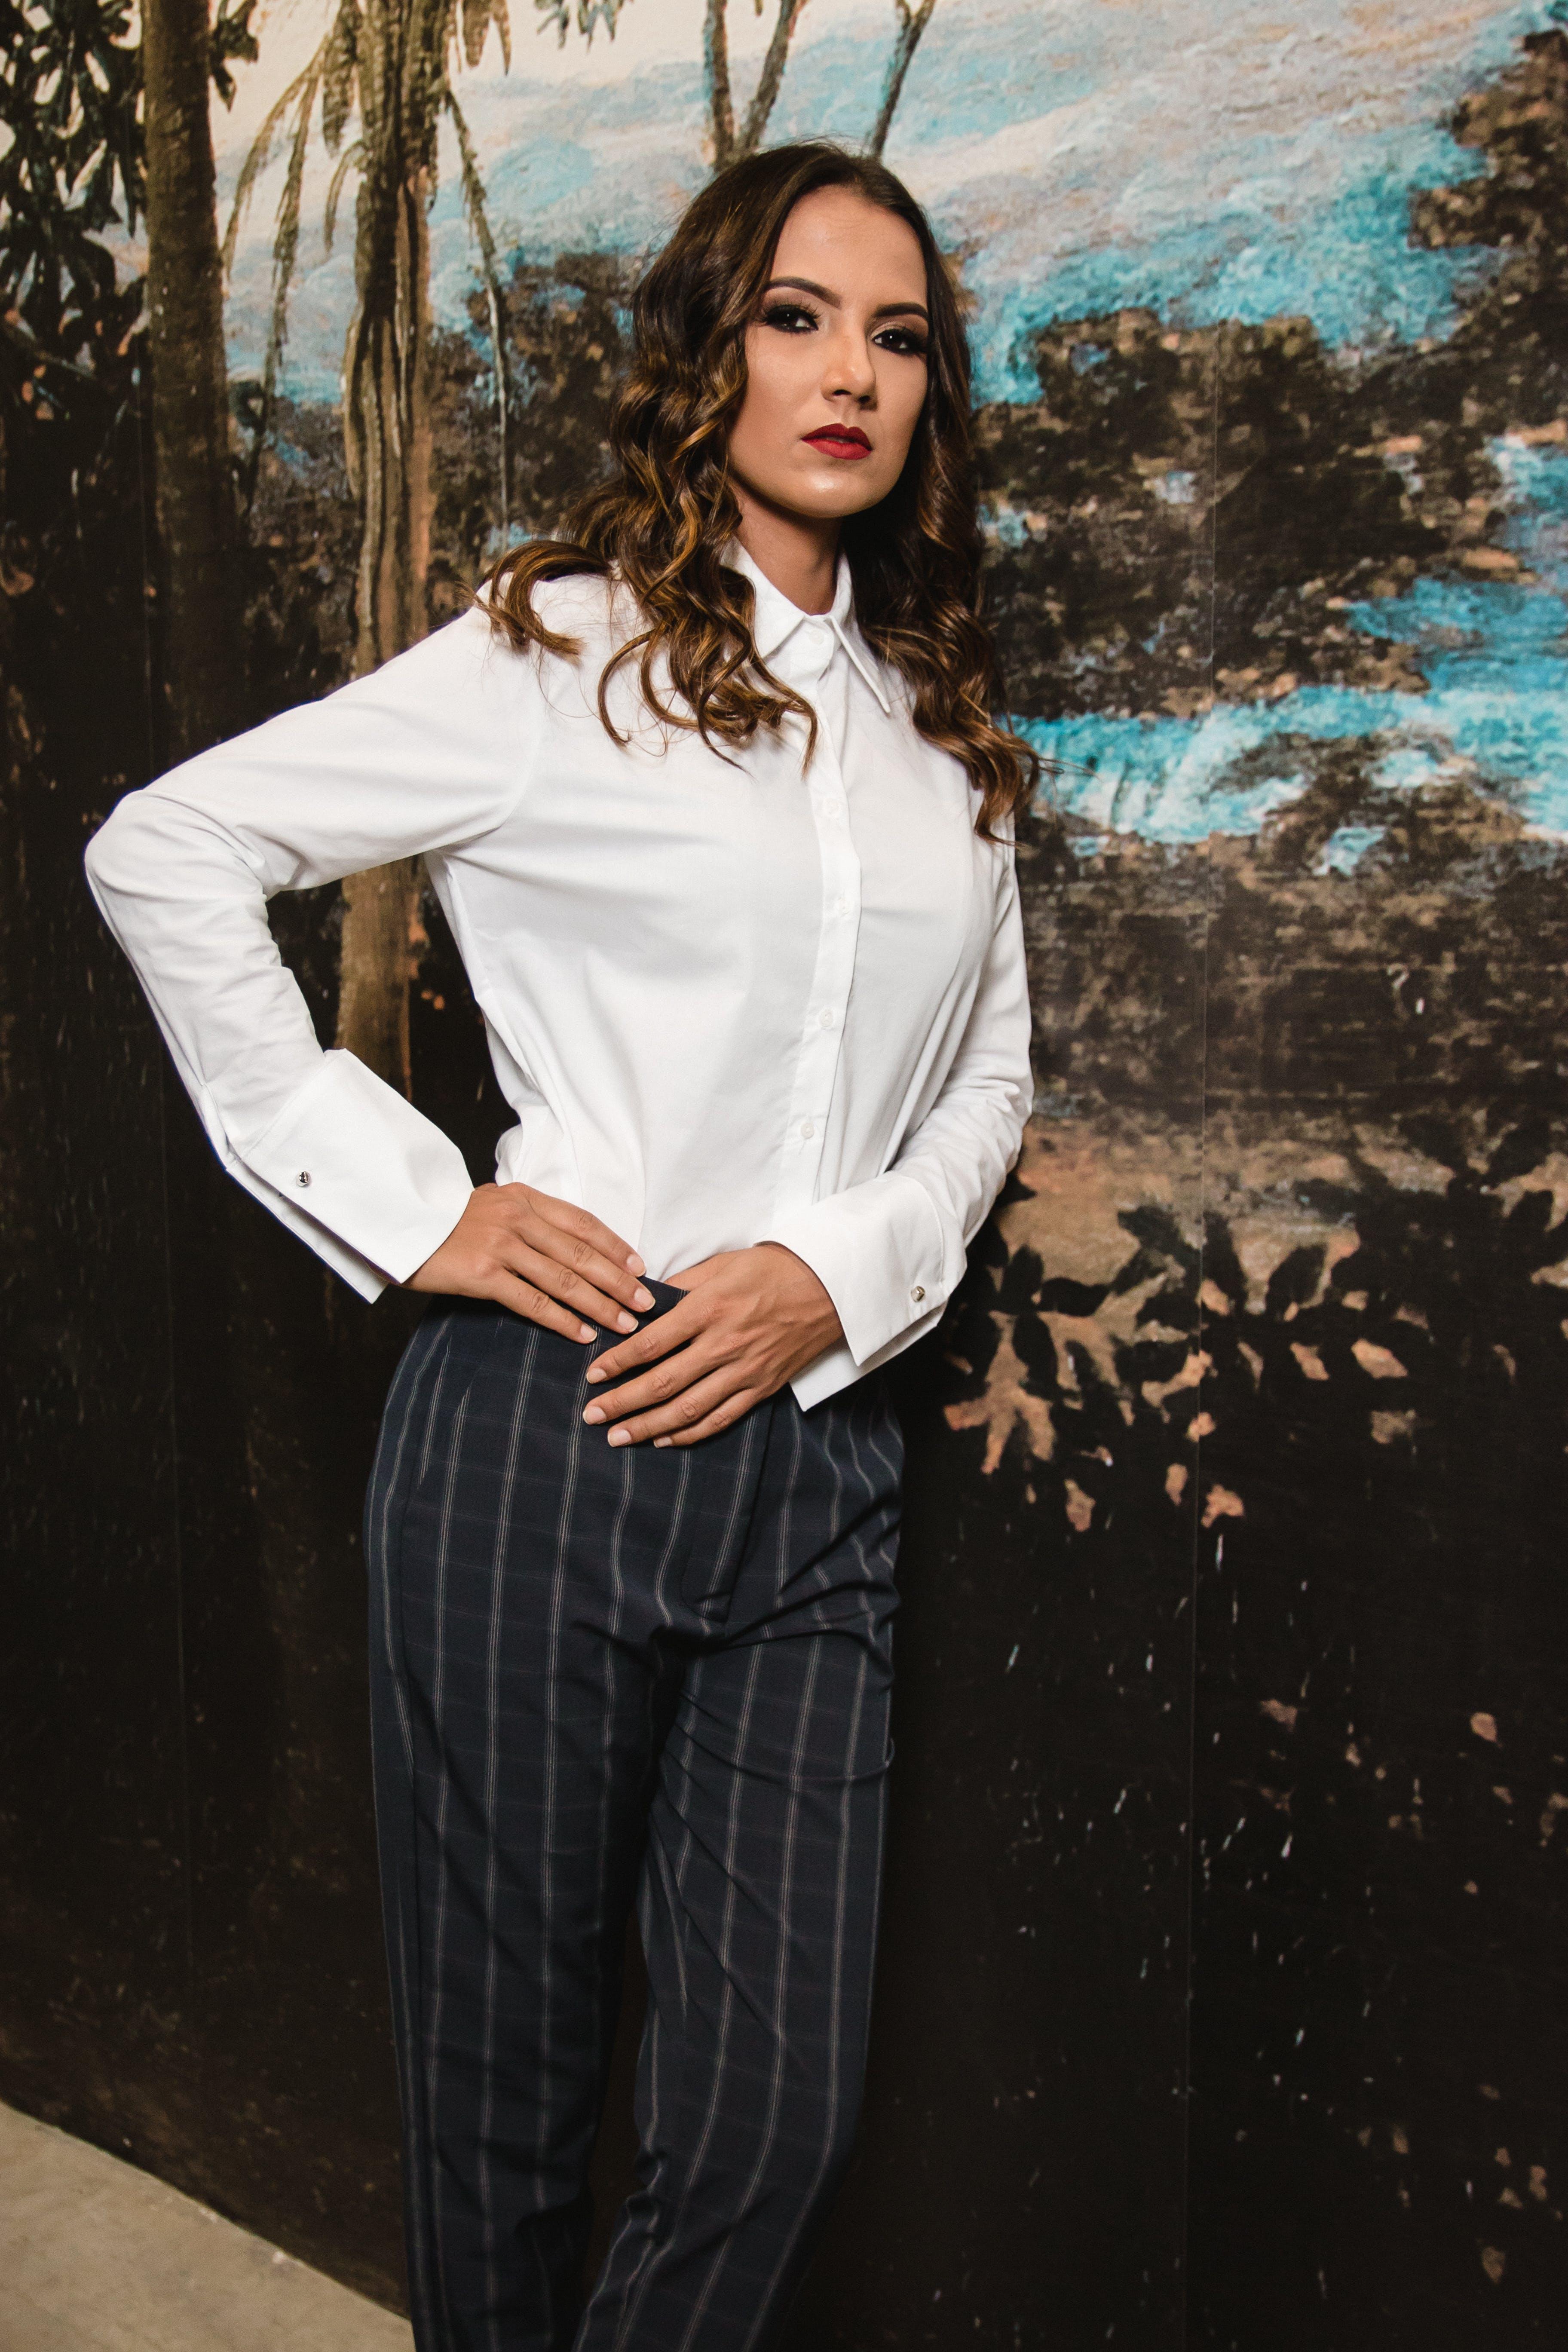 Woman Posing in Collard Long-sleeved Shirt and Grey Pants